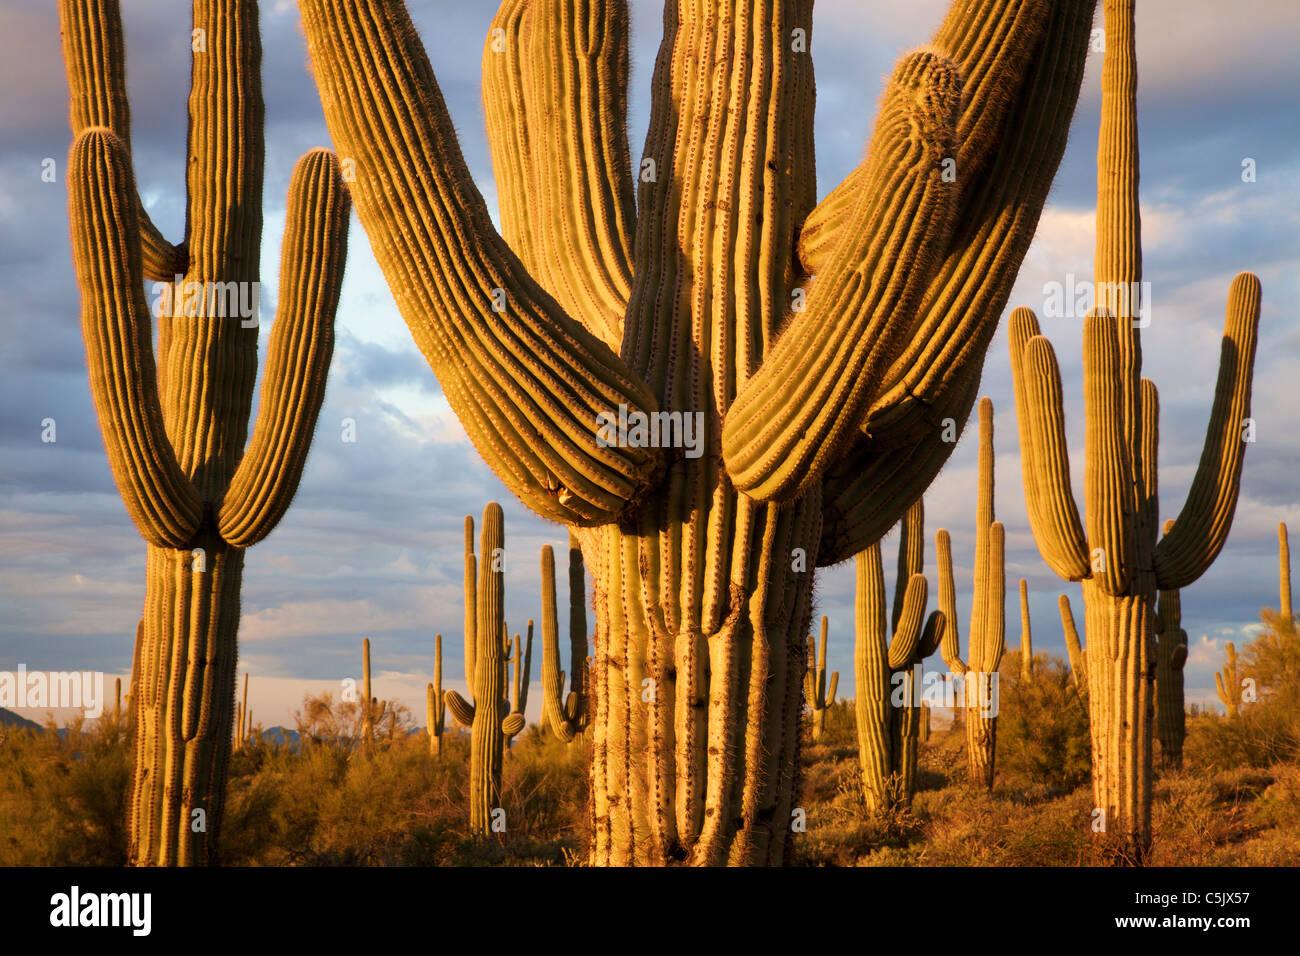 Saguaro cactus, Tonto National Forest, East of Phoenix, Arizona. - Stock Image